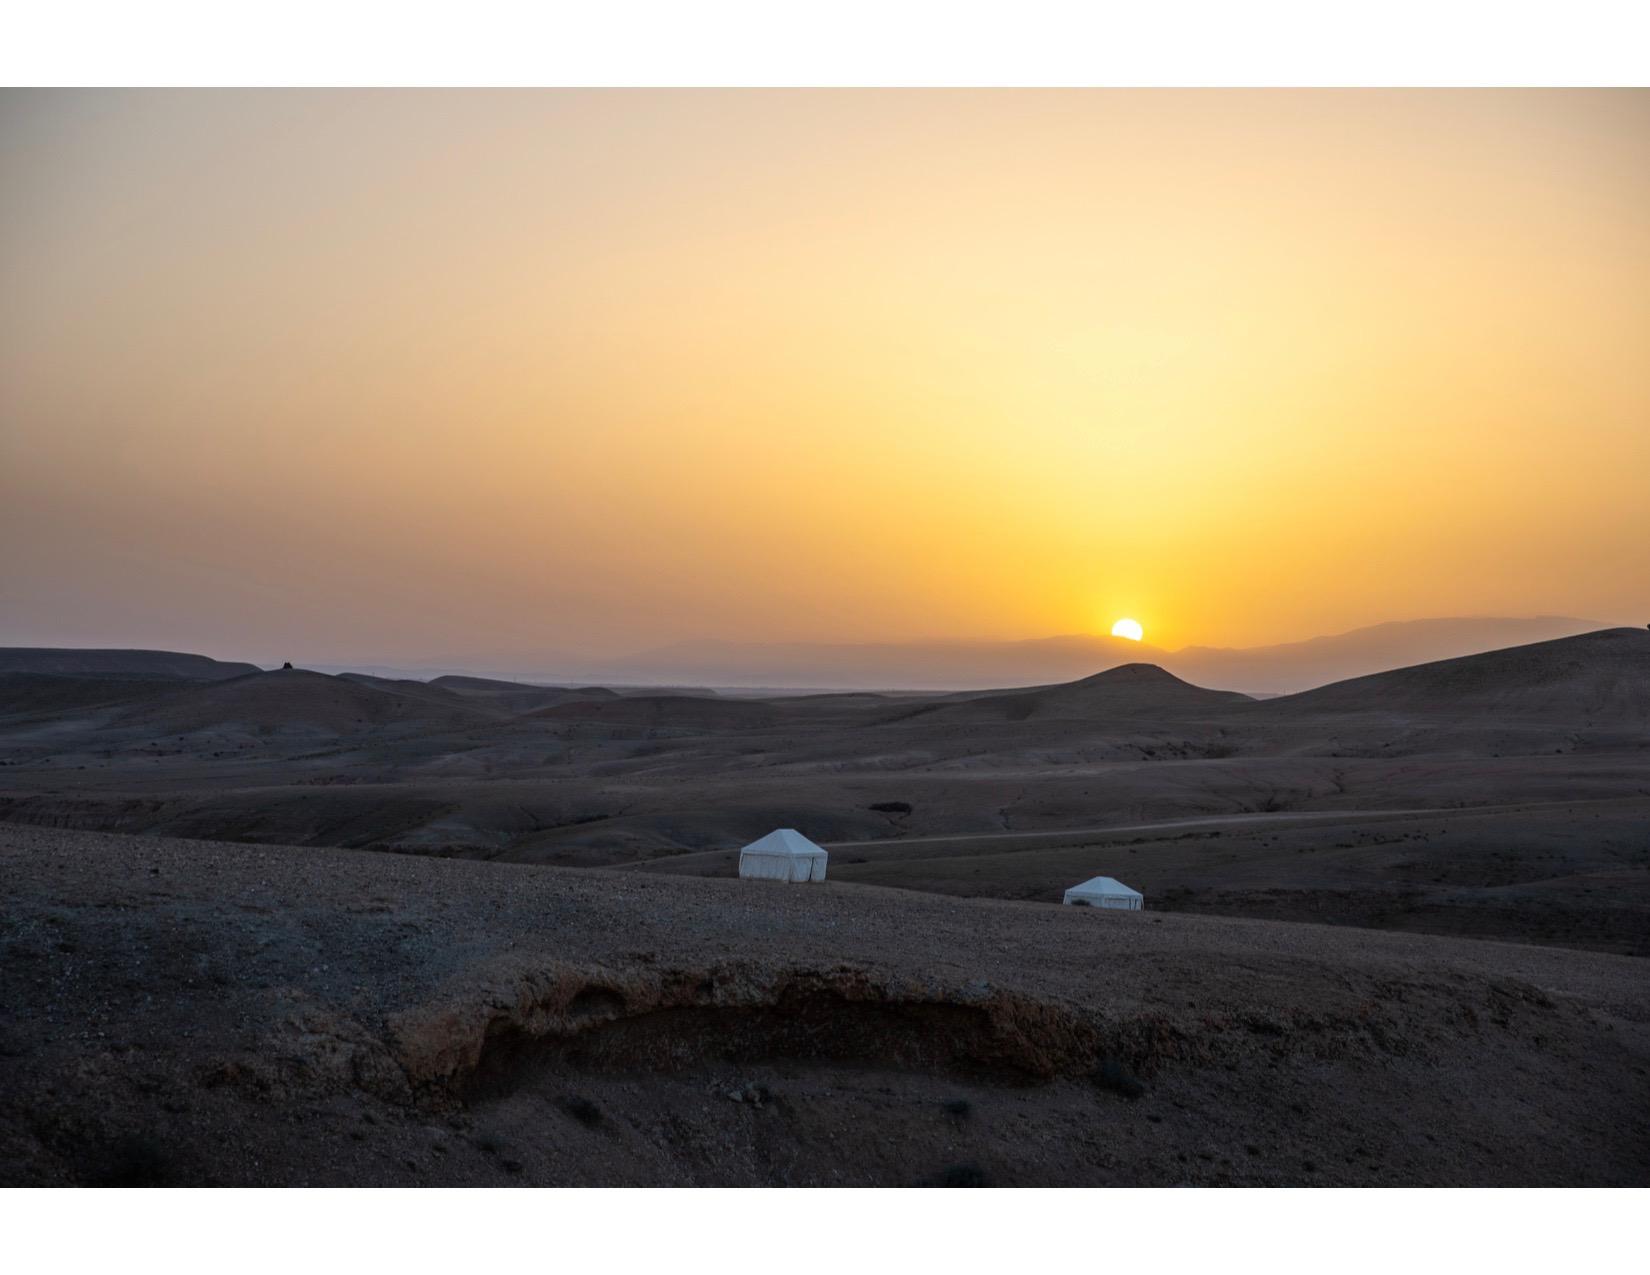 Firepot - Morocco-14.jpg